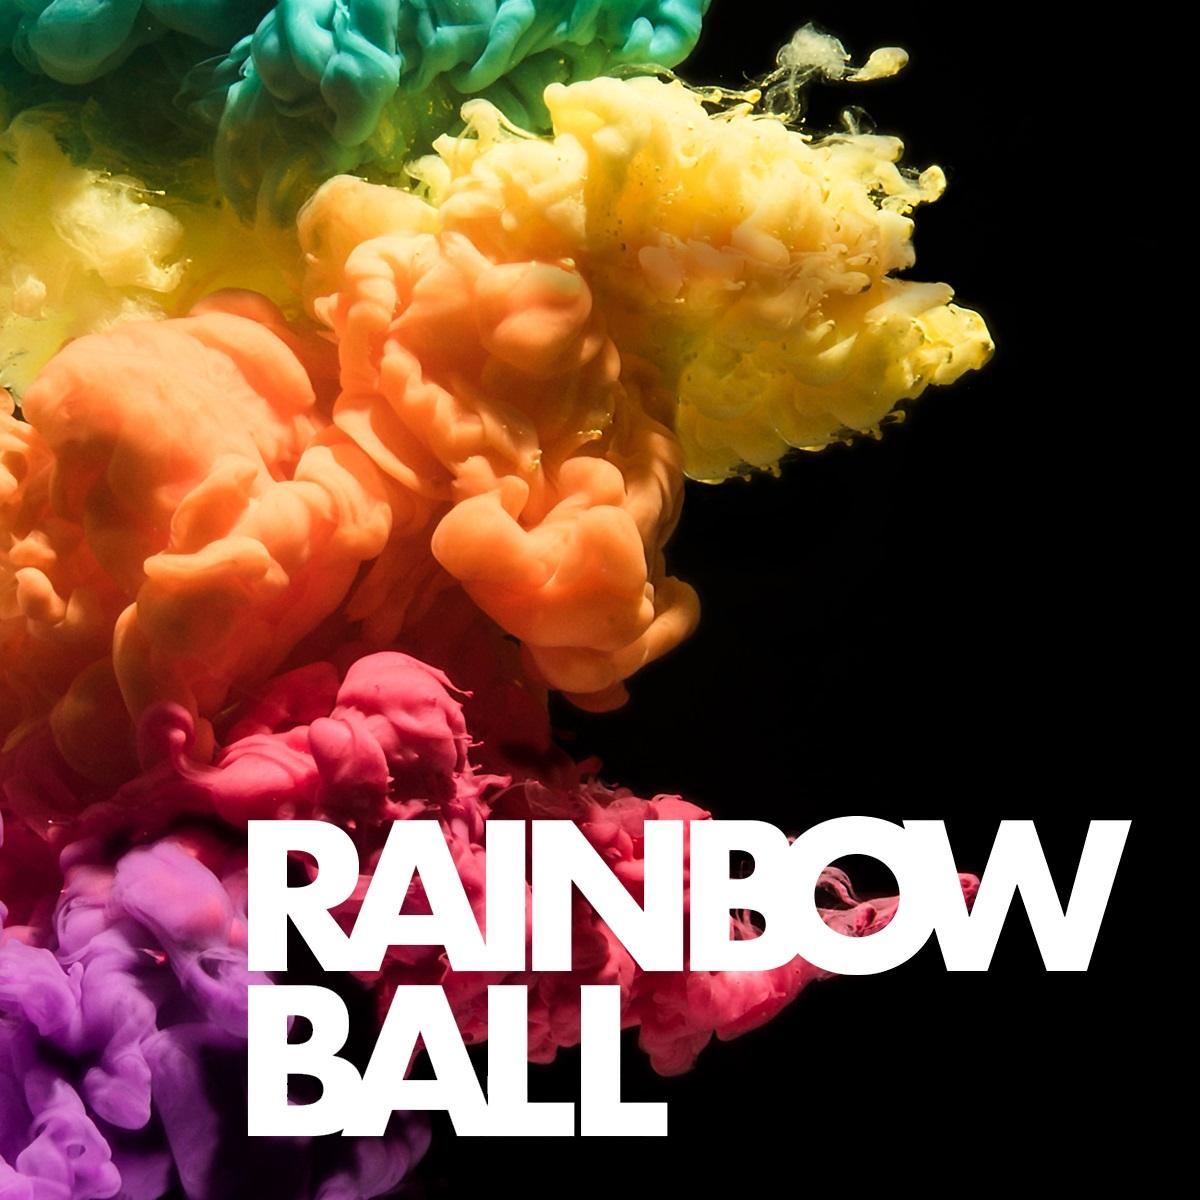 rainbow coloured dust clouds and text reading Rainbow Ball